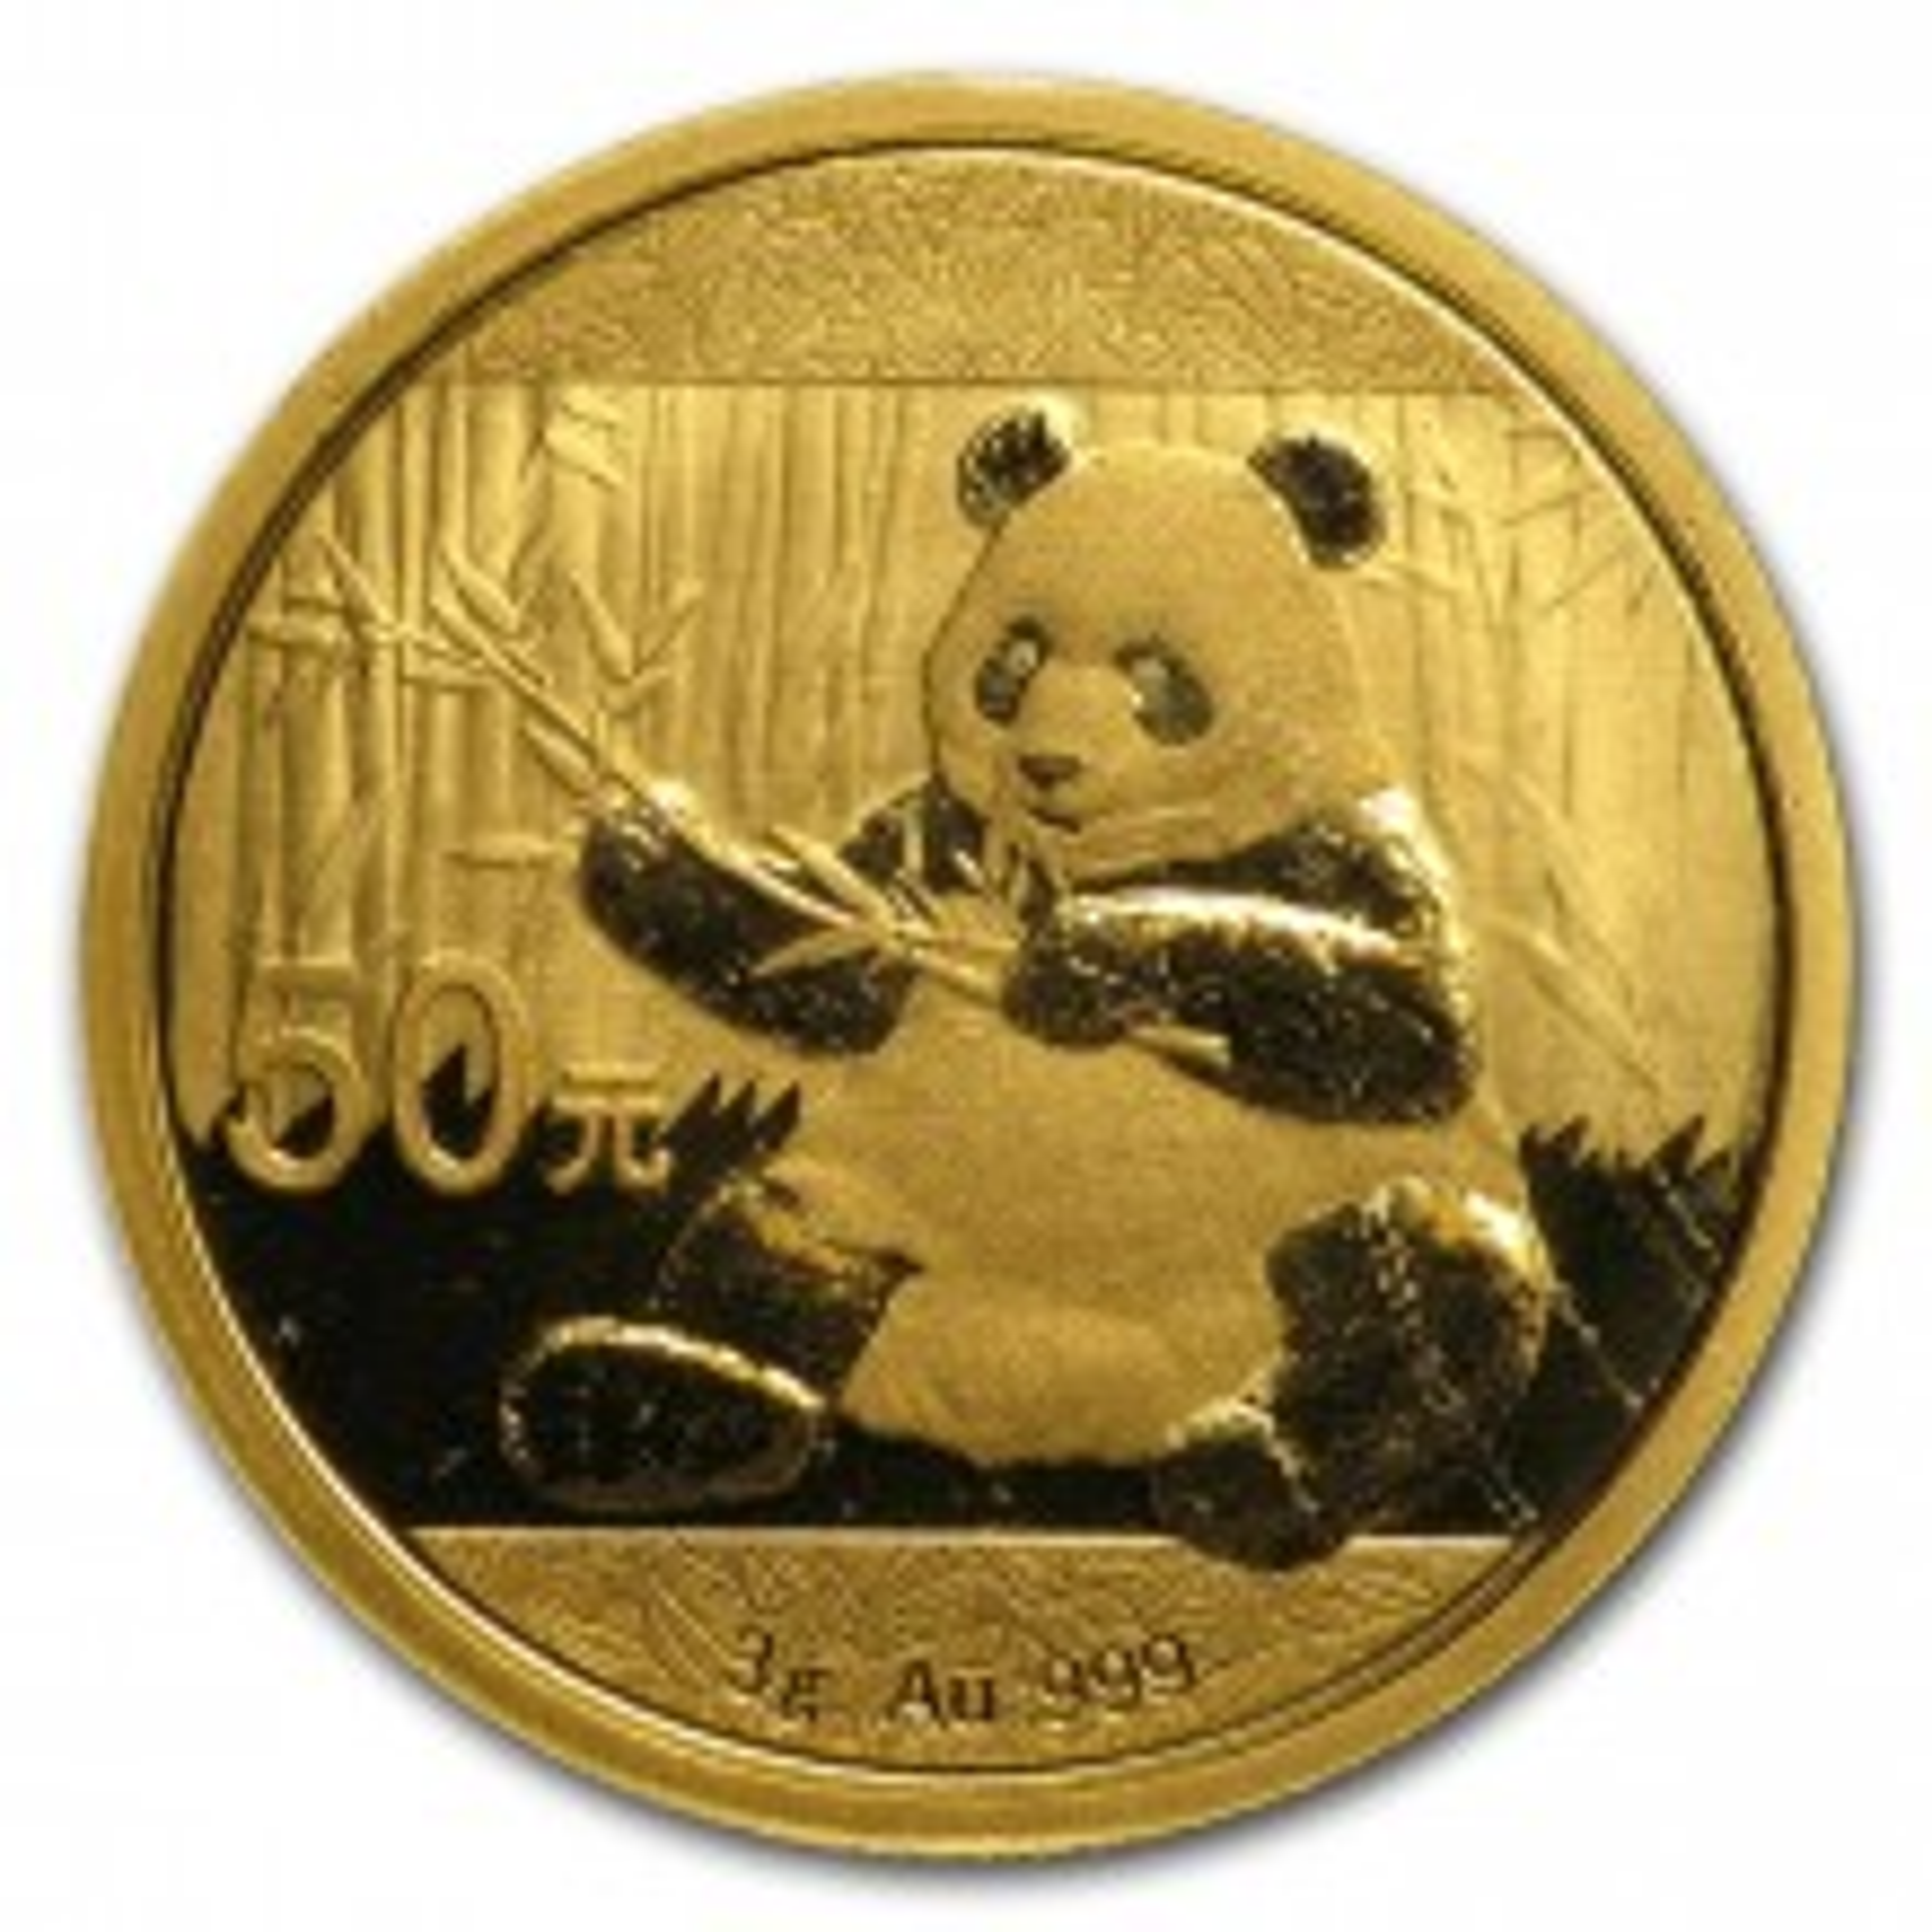 3 Gram gouden Panda munt 2017